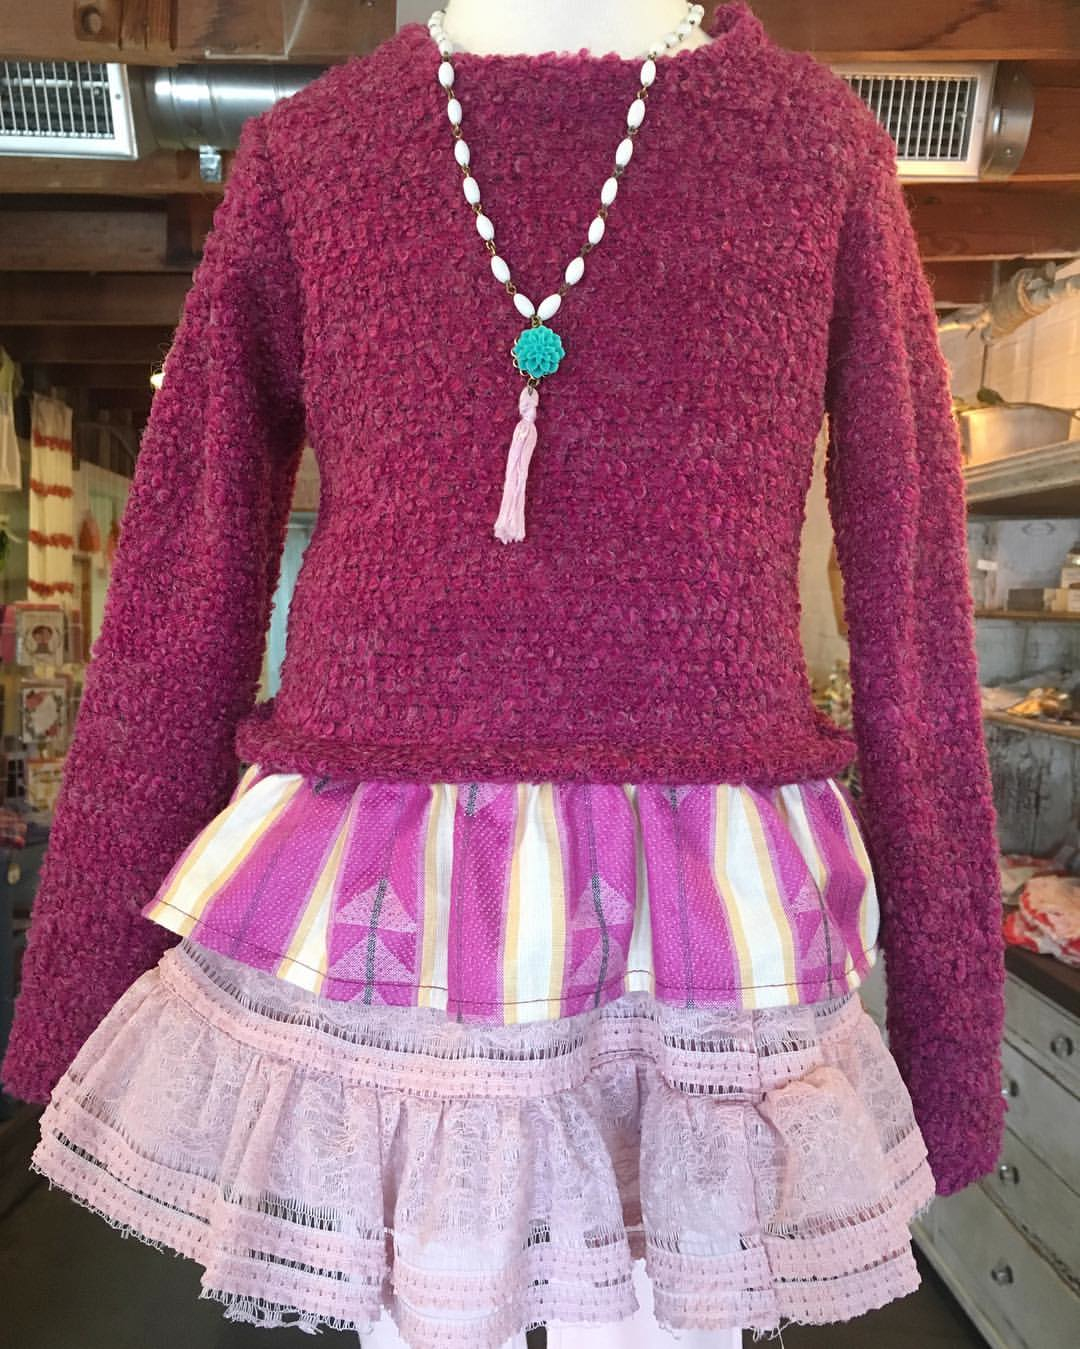 A Purple Tutu and Texture